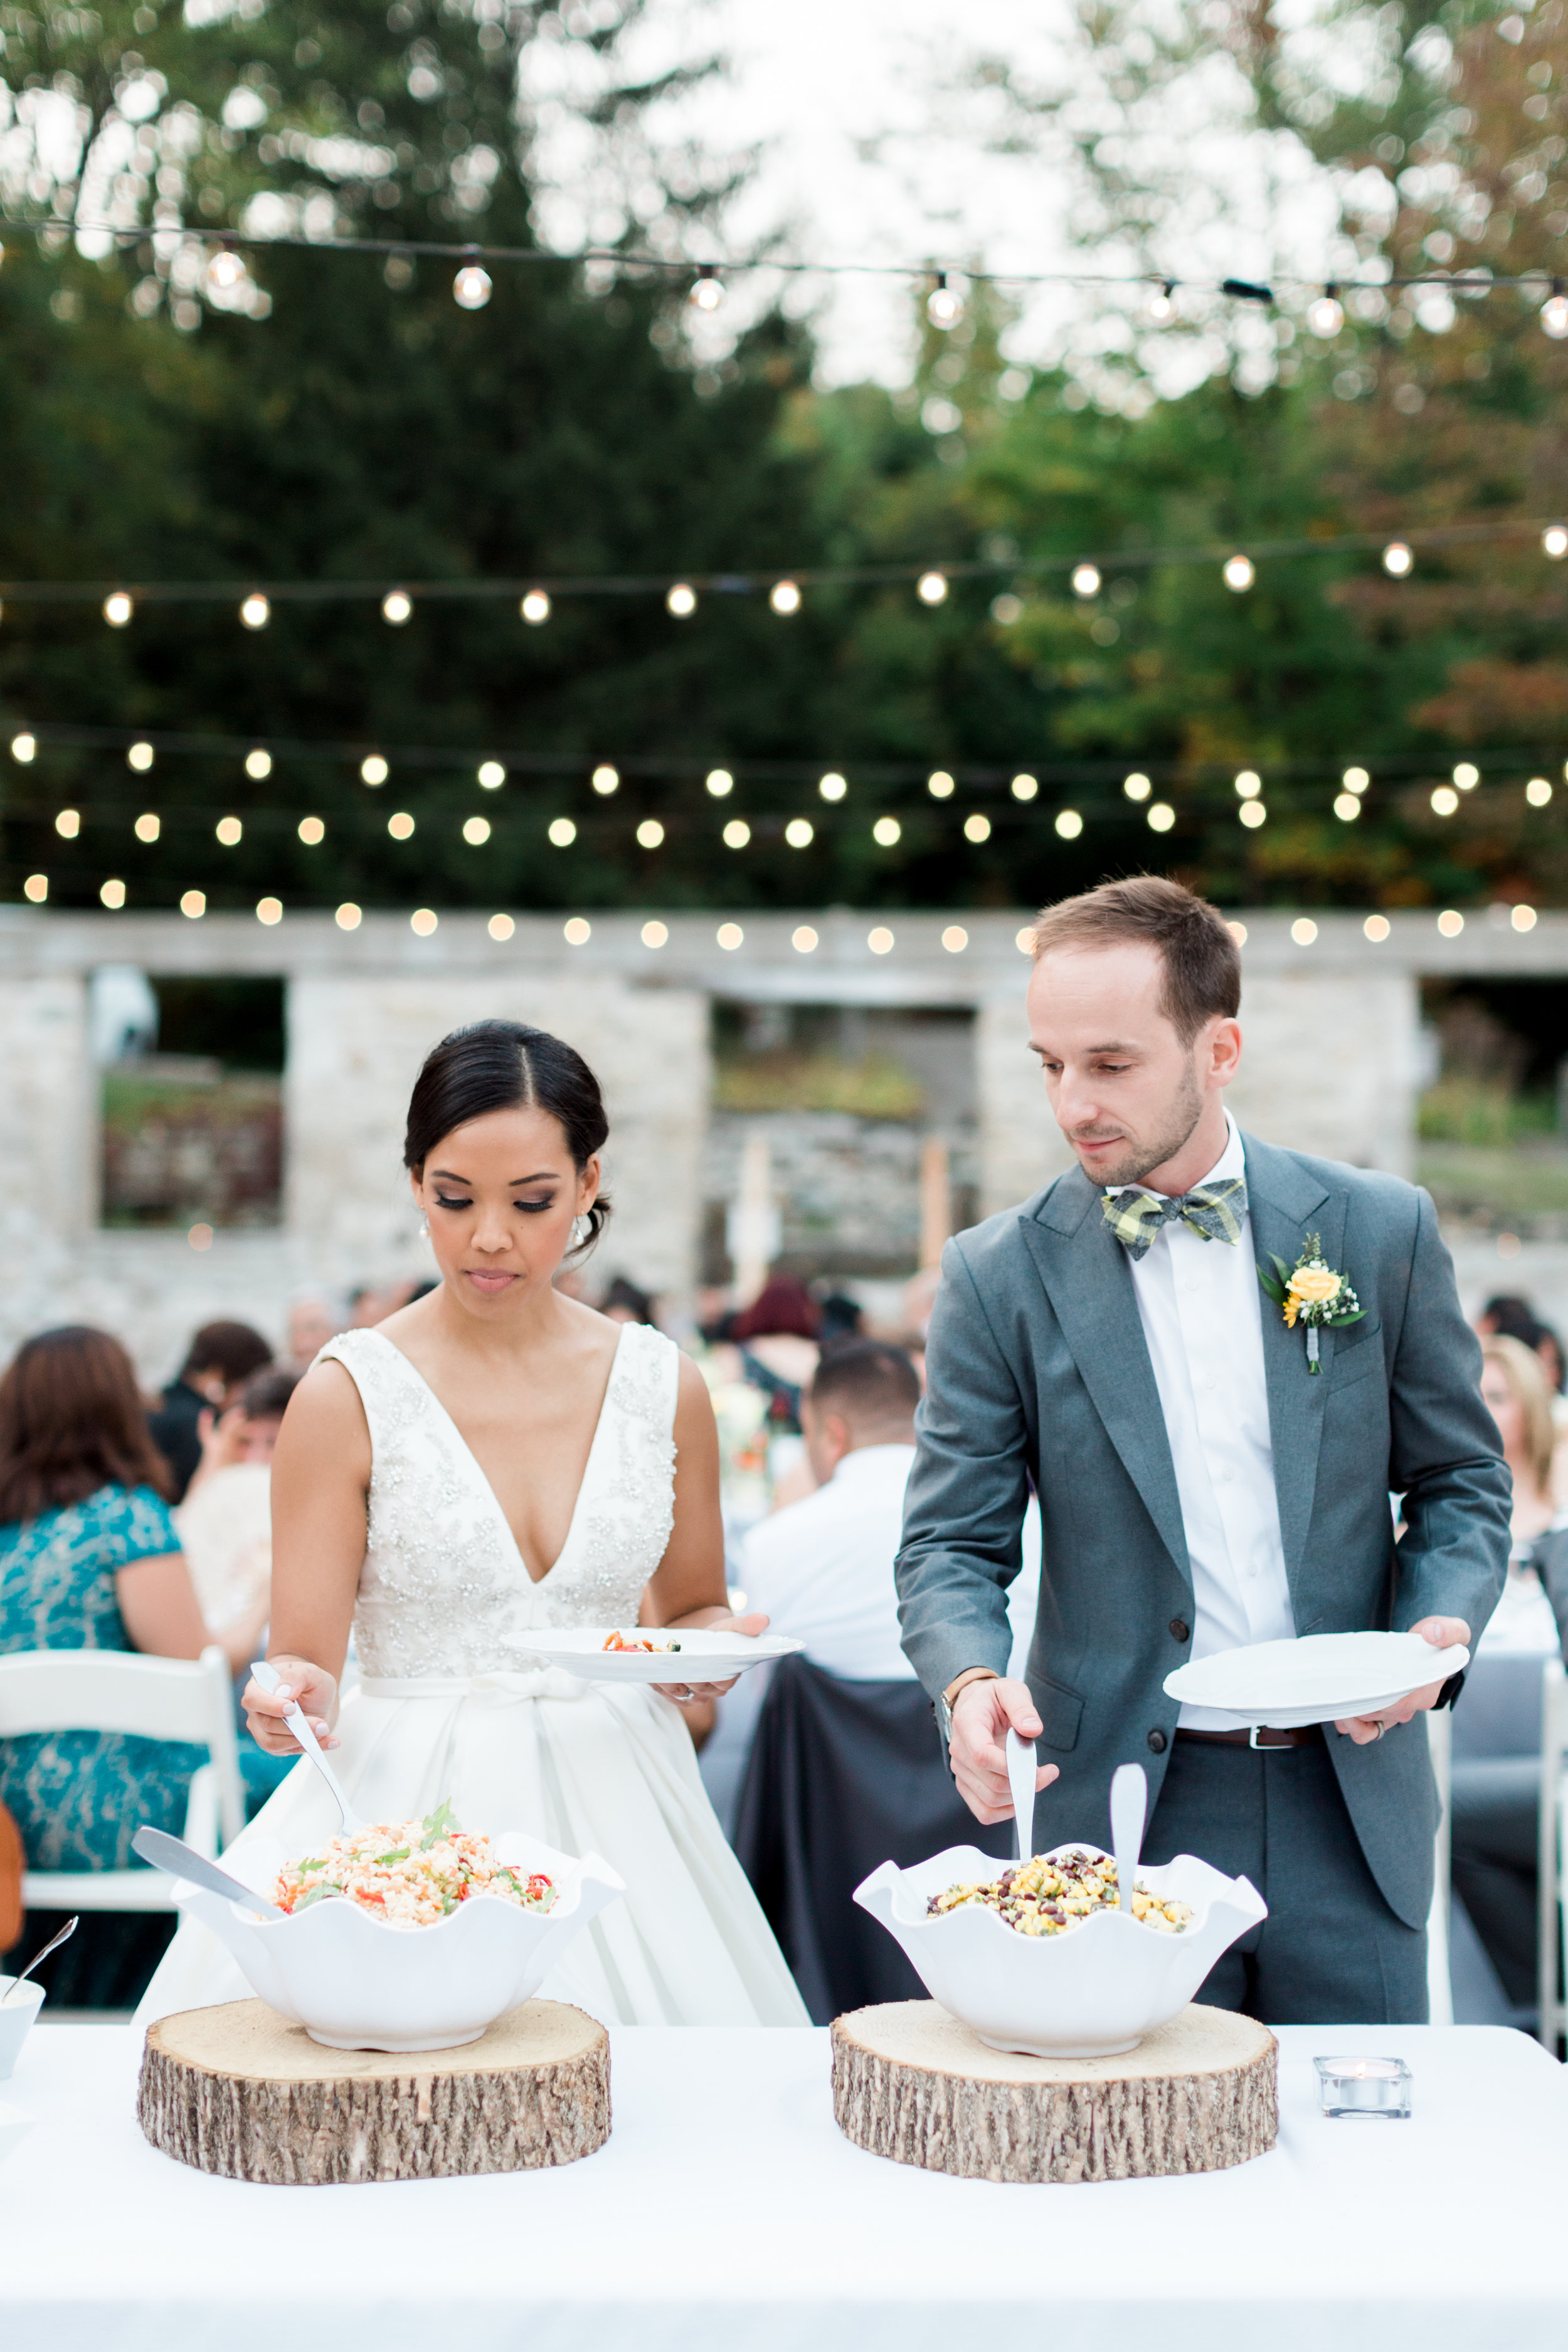 Alton Mills Wedding - Reception-82.jpg